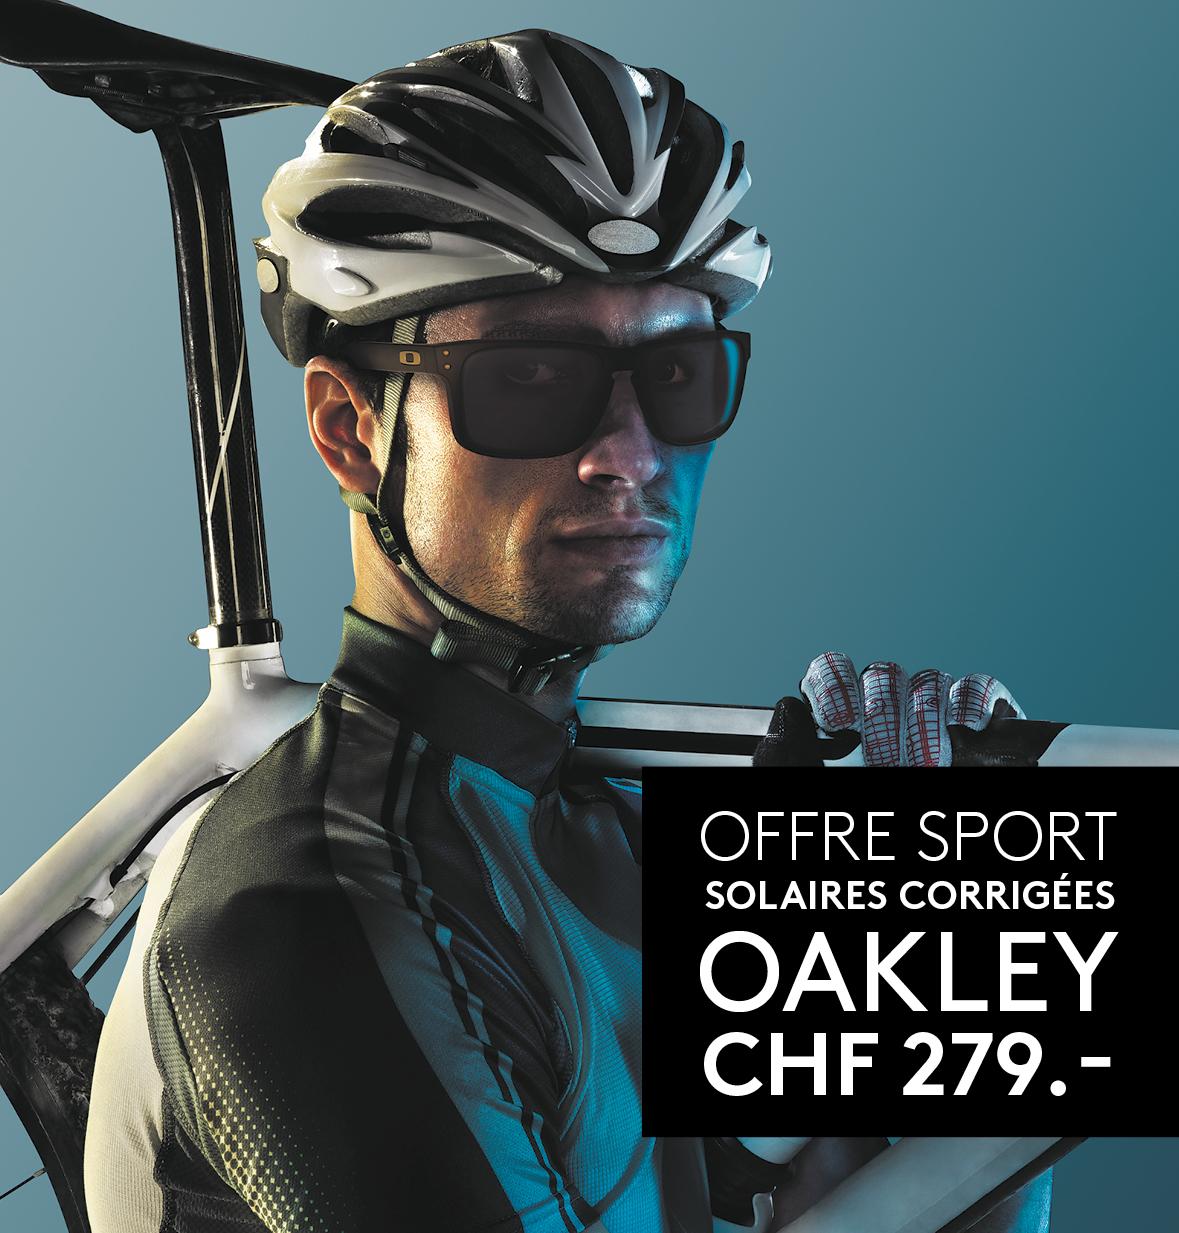 Optic2000-offre-sport